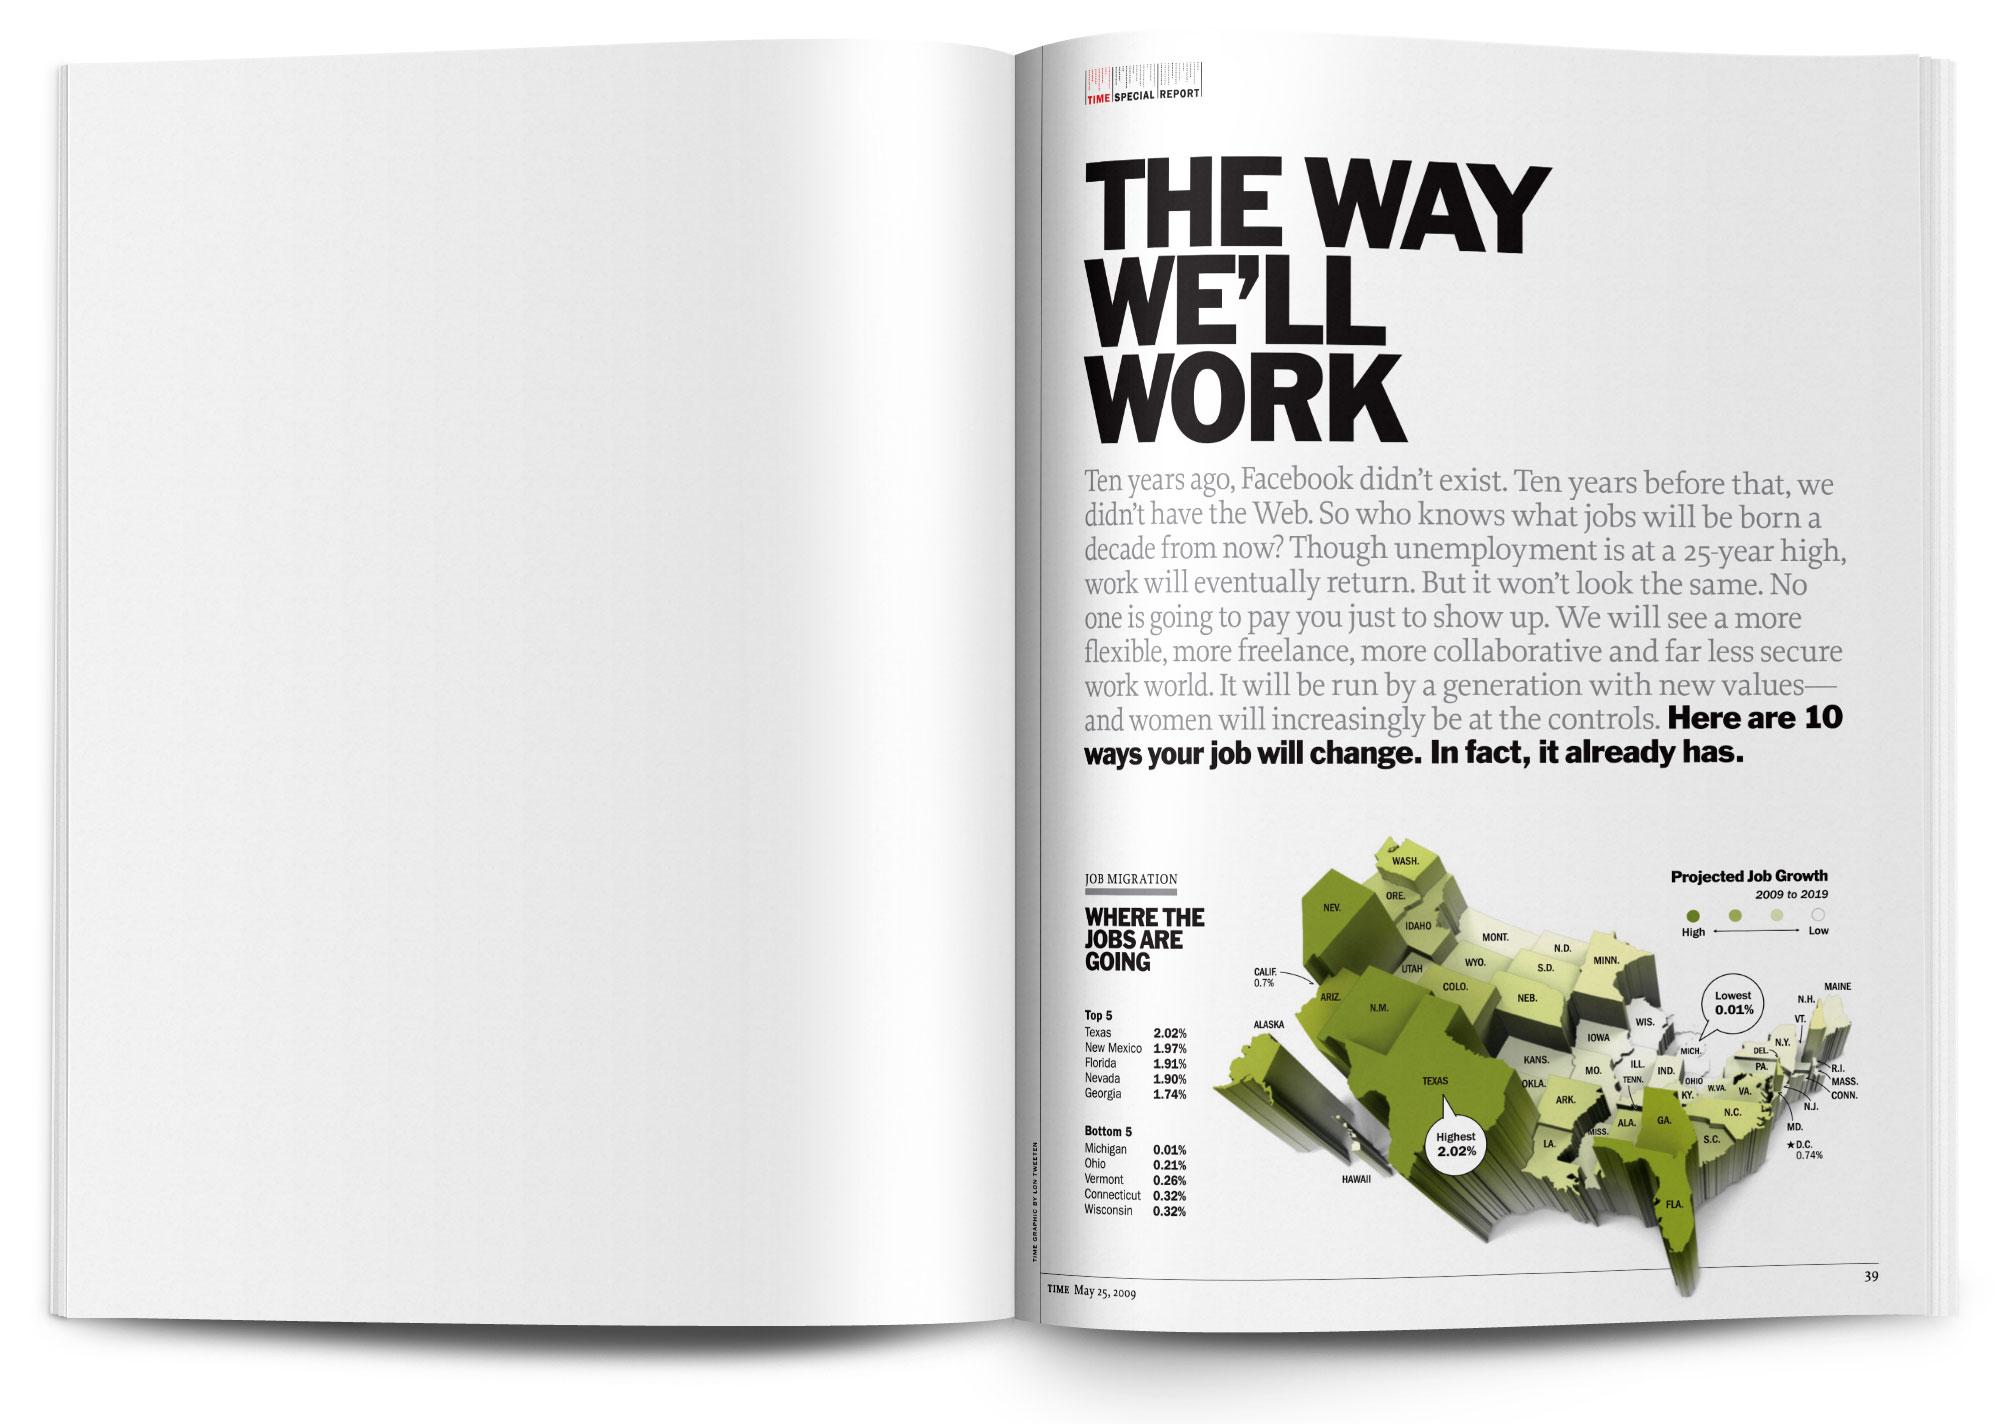 layouts.waywework1.jpg